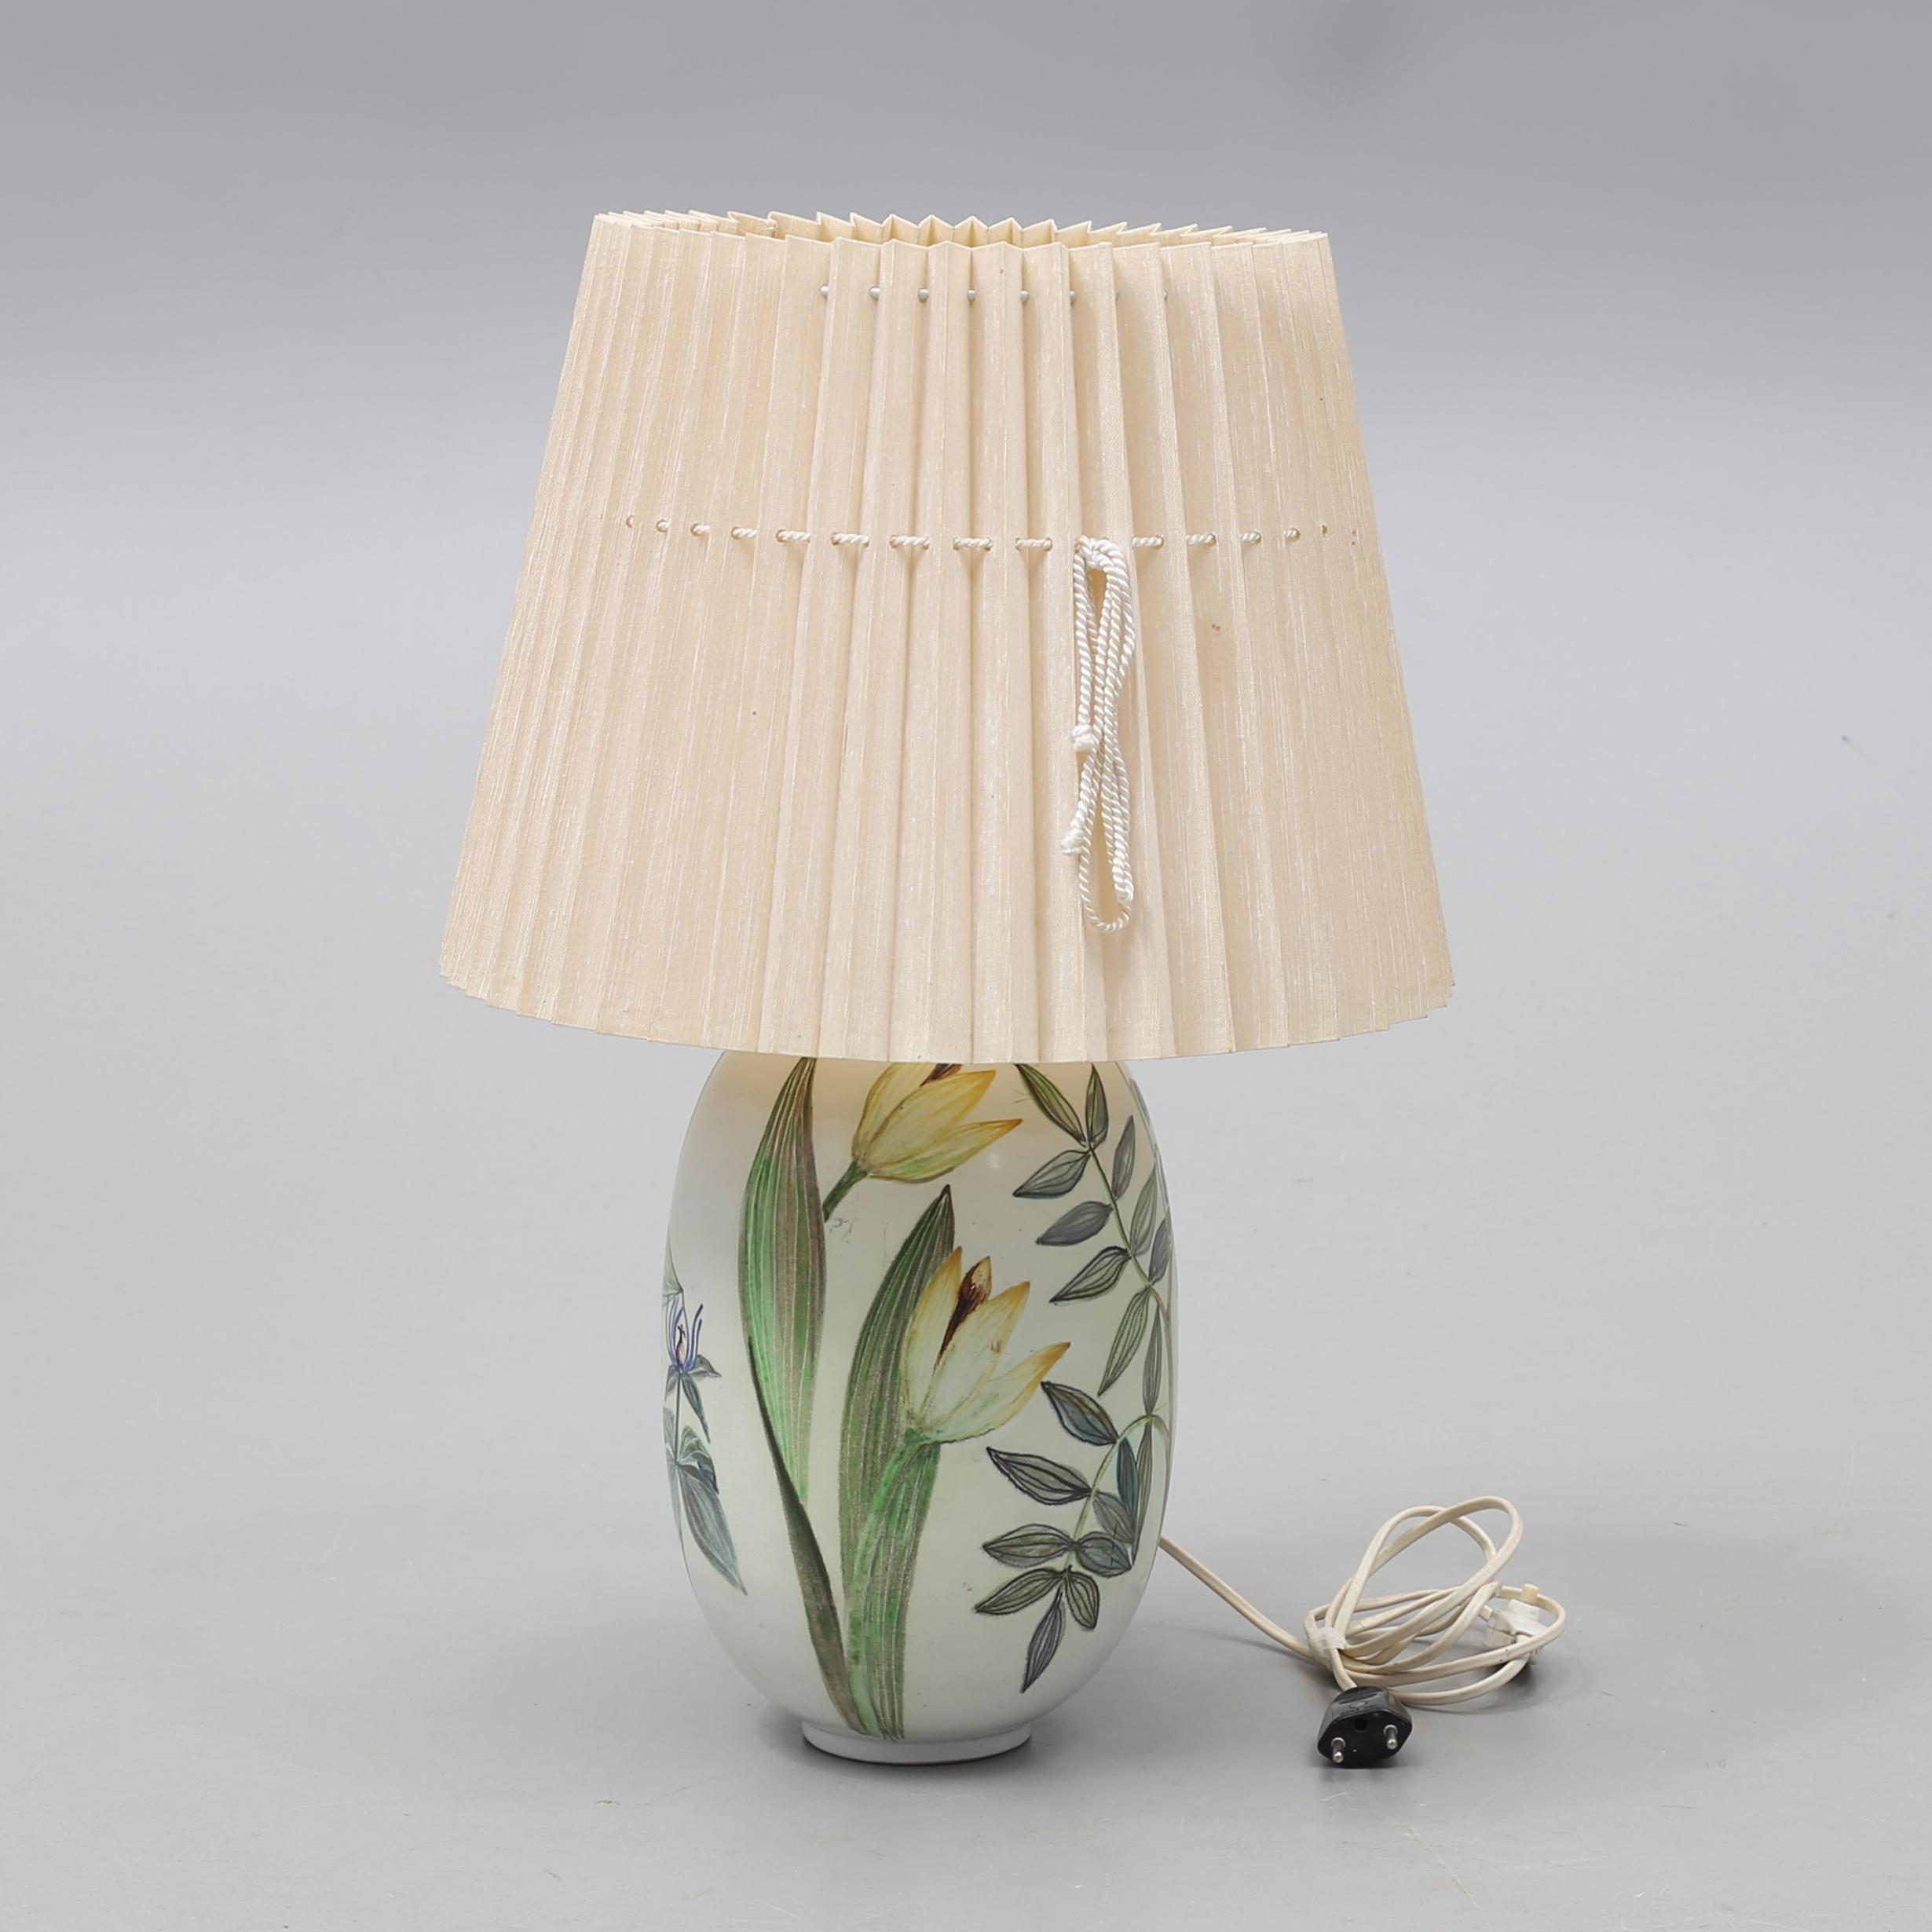 CARL HARRY STÅLHANE. Table lamp, ceramics, Artium, Rörstrand